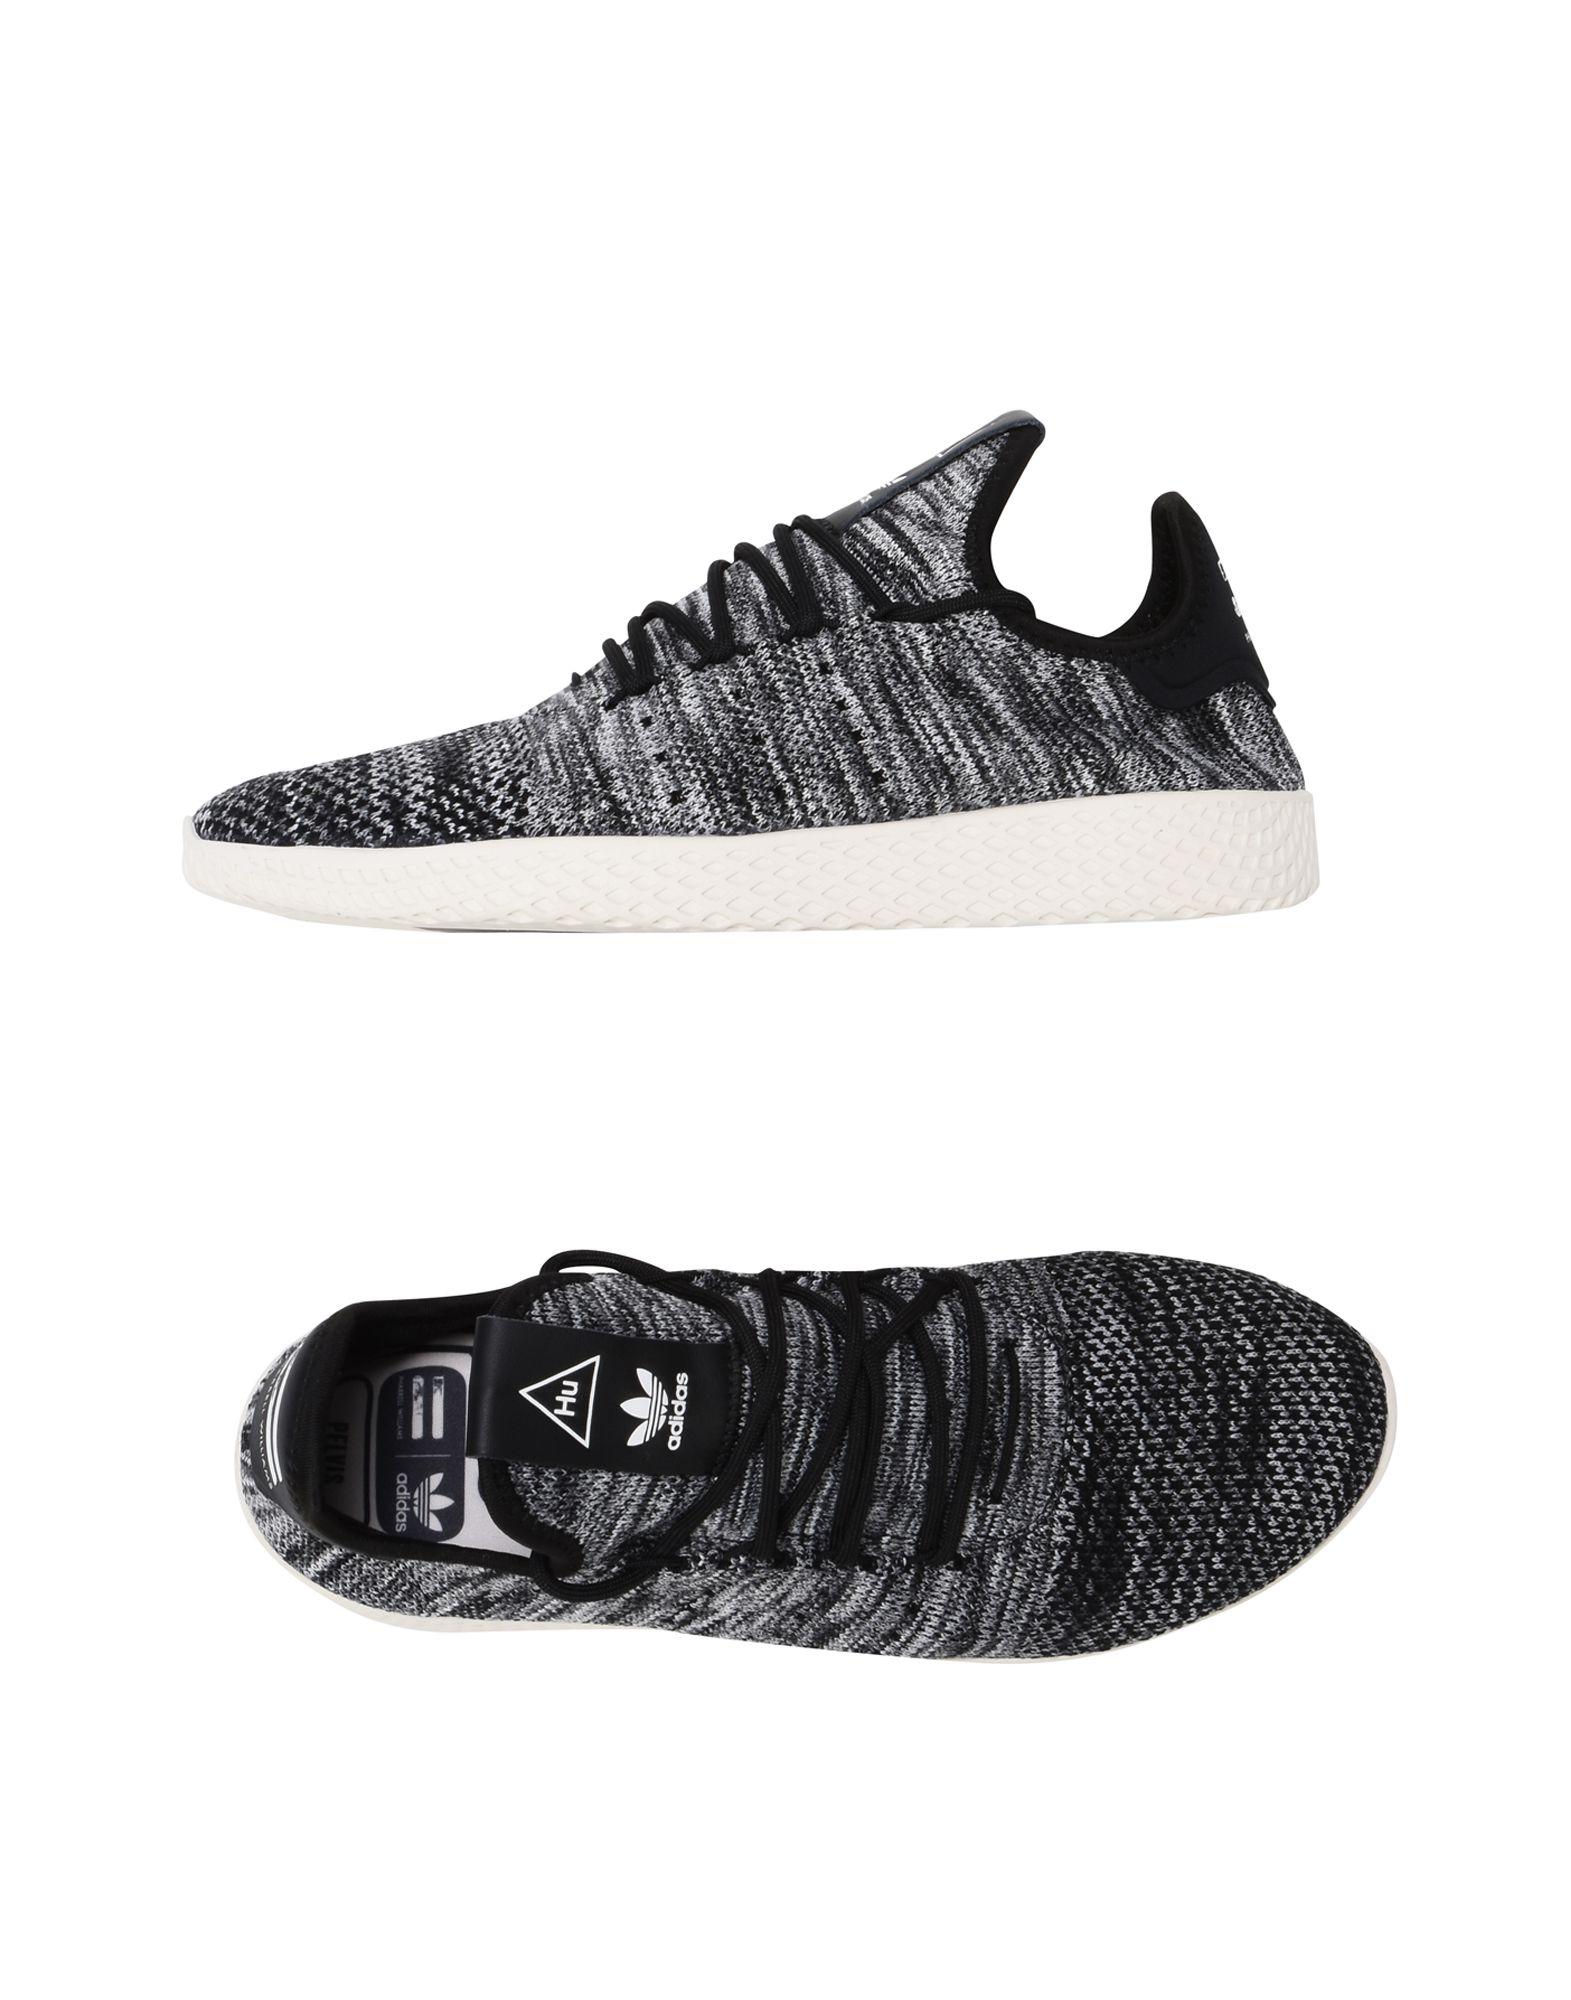 Sneakers Adidas Originals By Pharrell Williams Pw Tennis Hu Pk - Uomo - Acquista online su